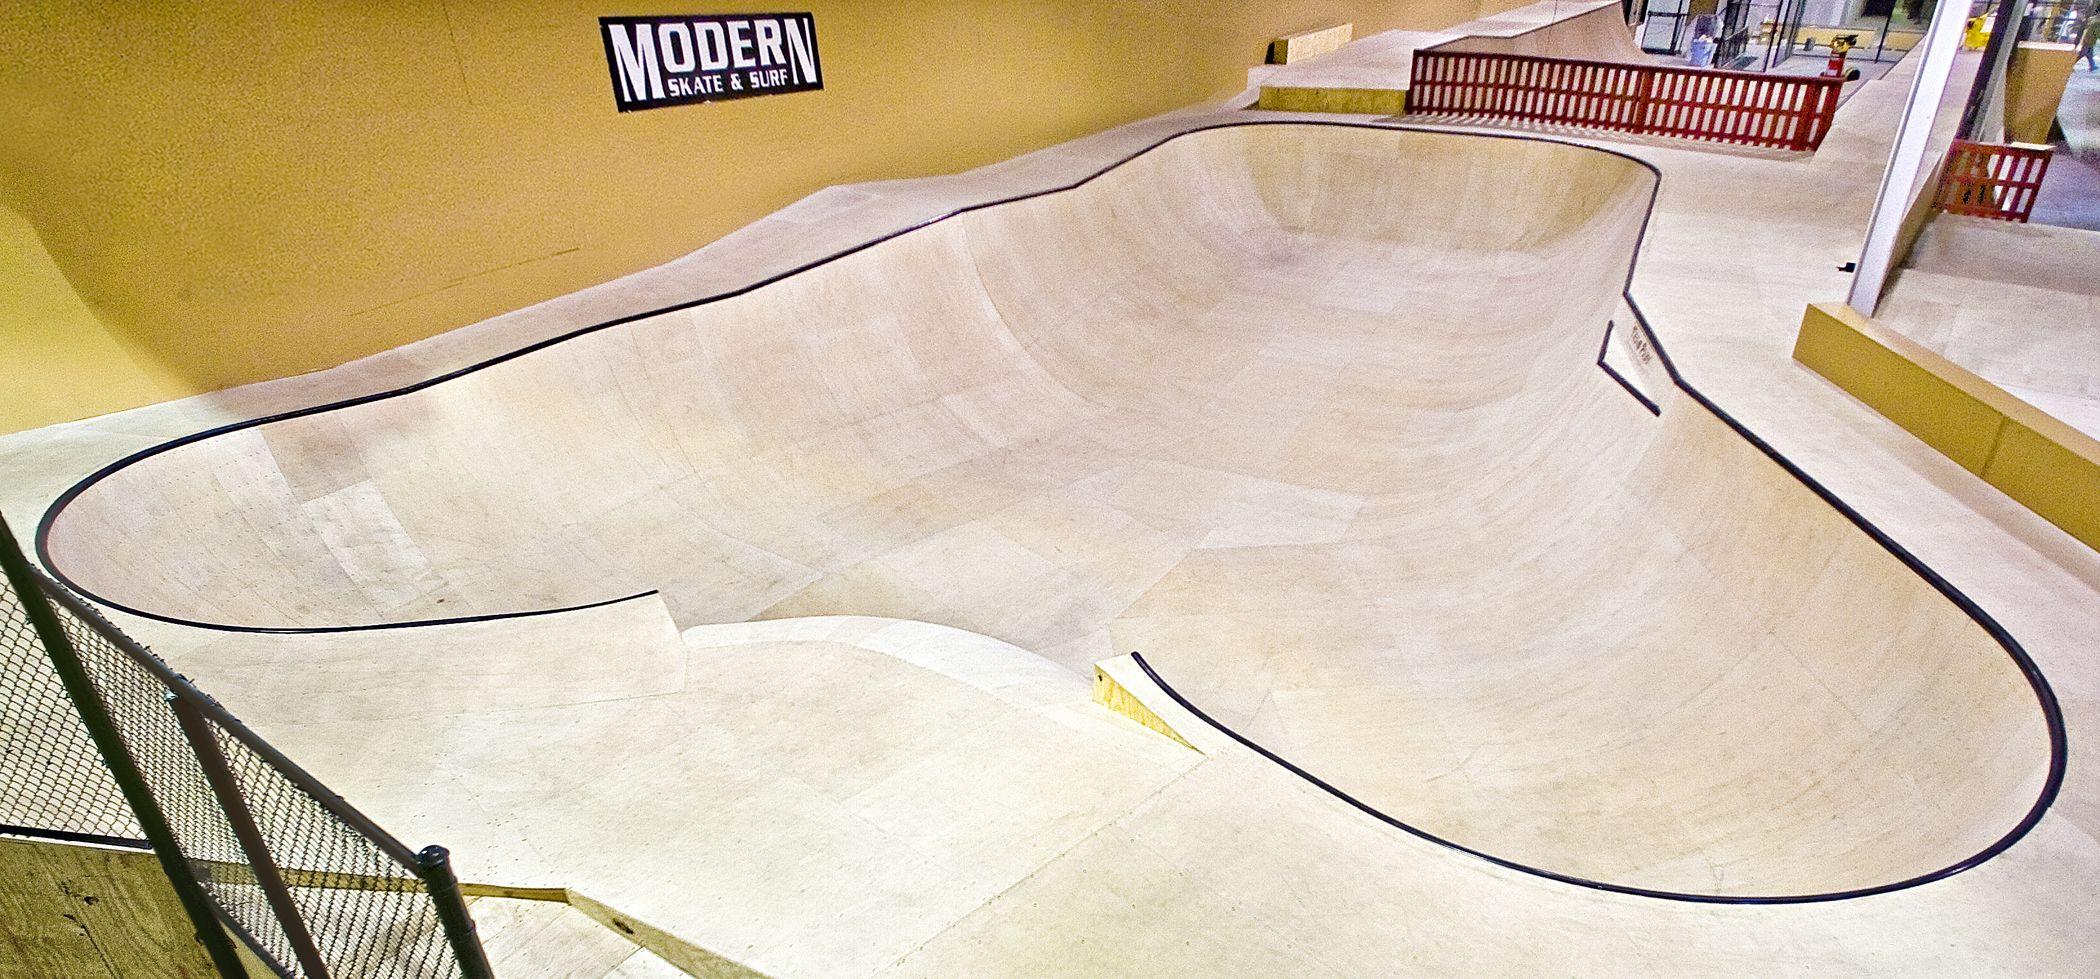 Bowl Modern Skatepark Royal Oak Michigan Usa Royal Oak Michigan Skate Park Royal Oak